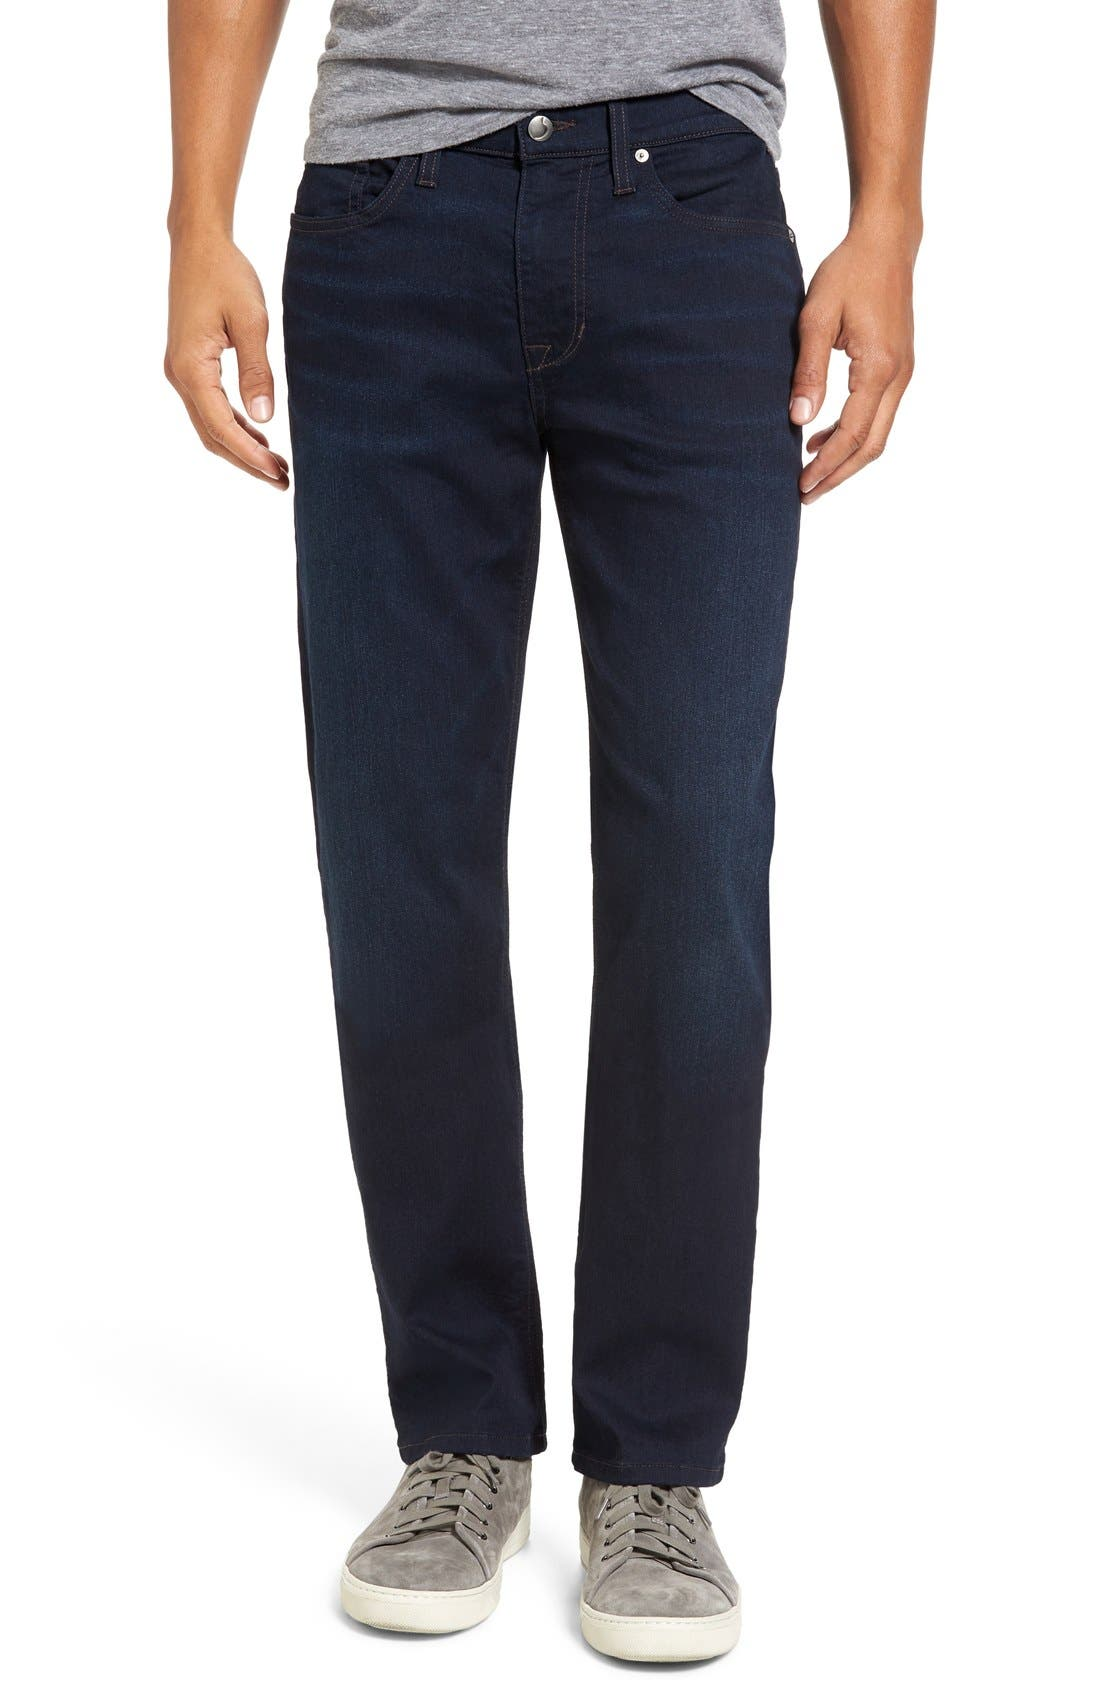 Brixton Kinetic Slim Straight Leg Jeans,                         Main,                         color, 400